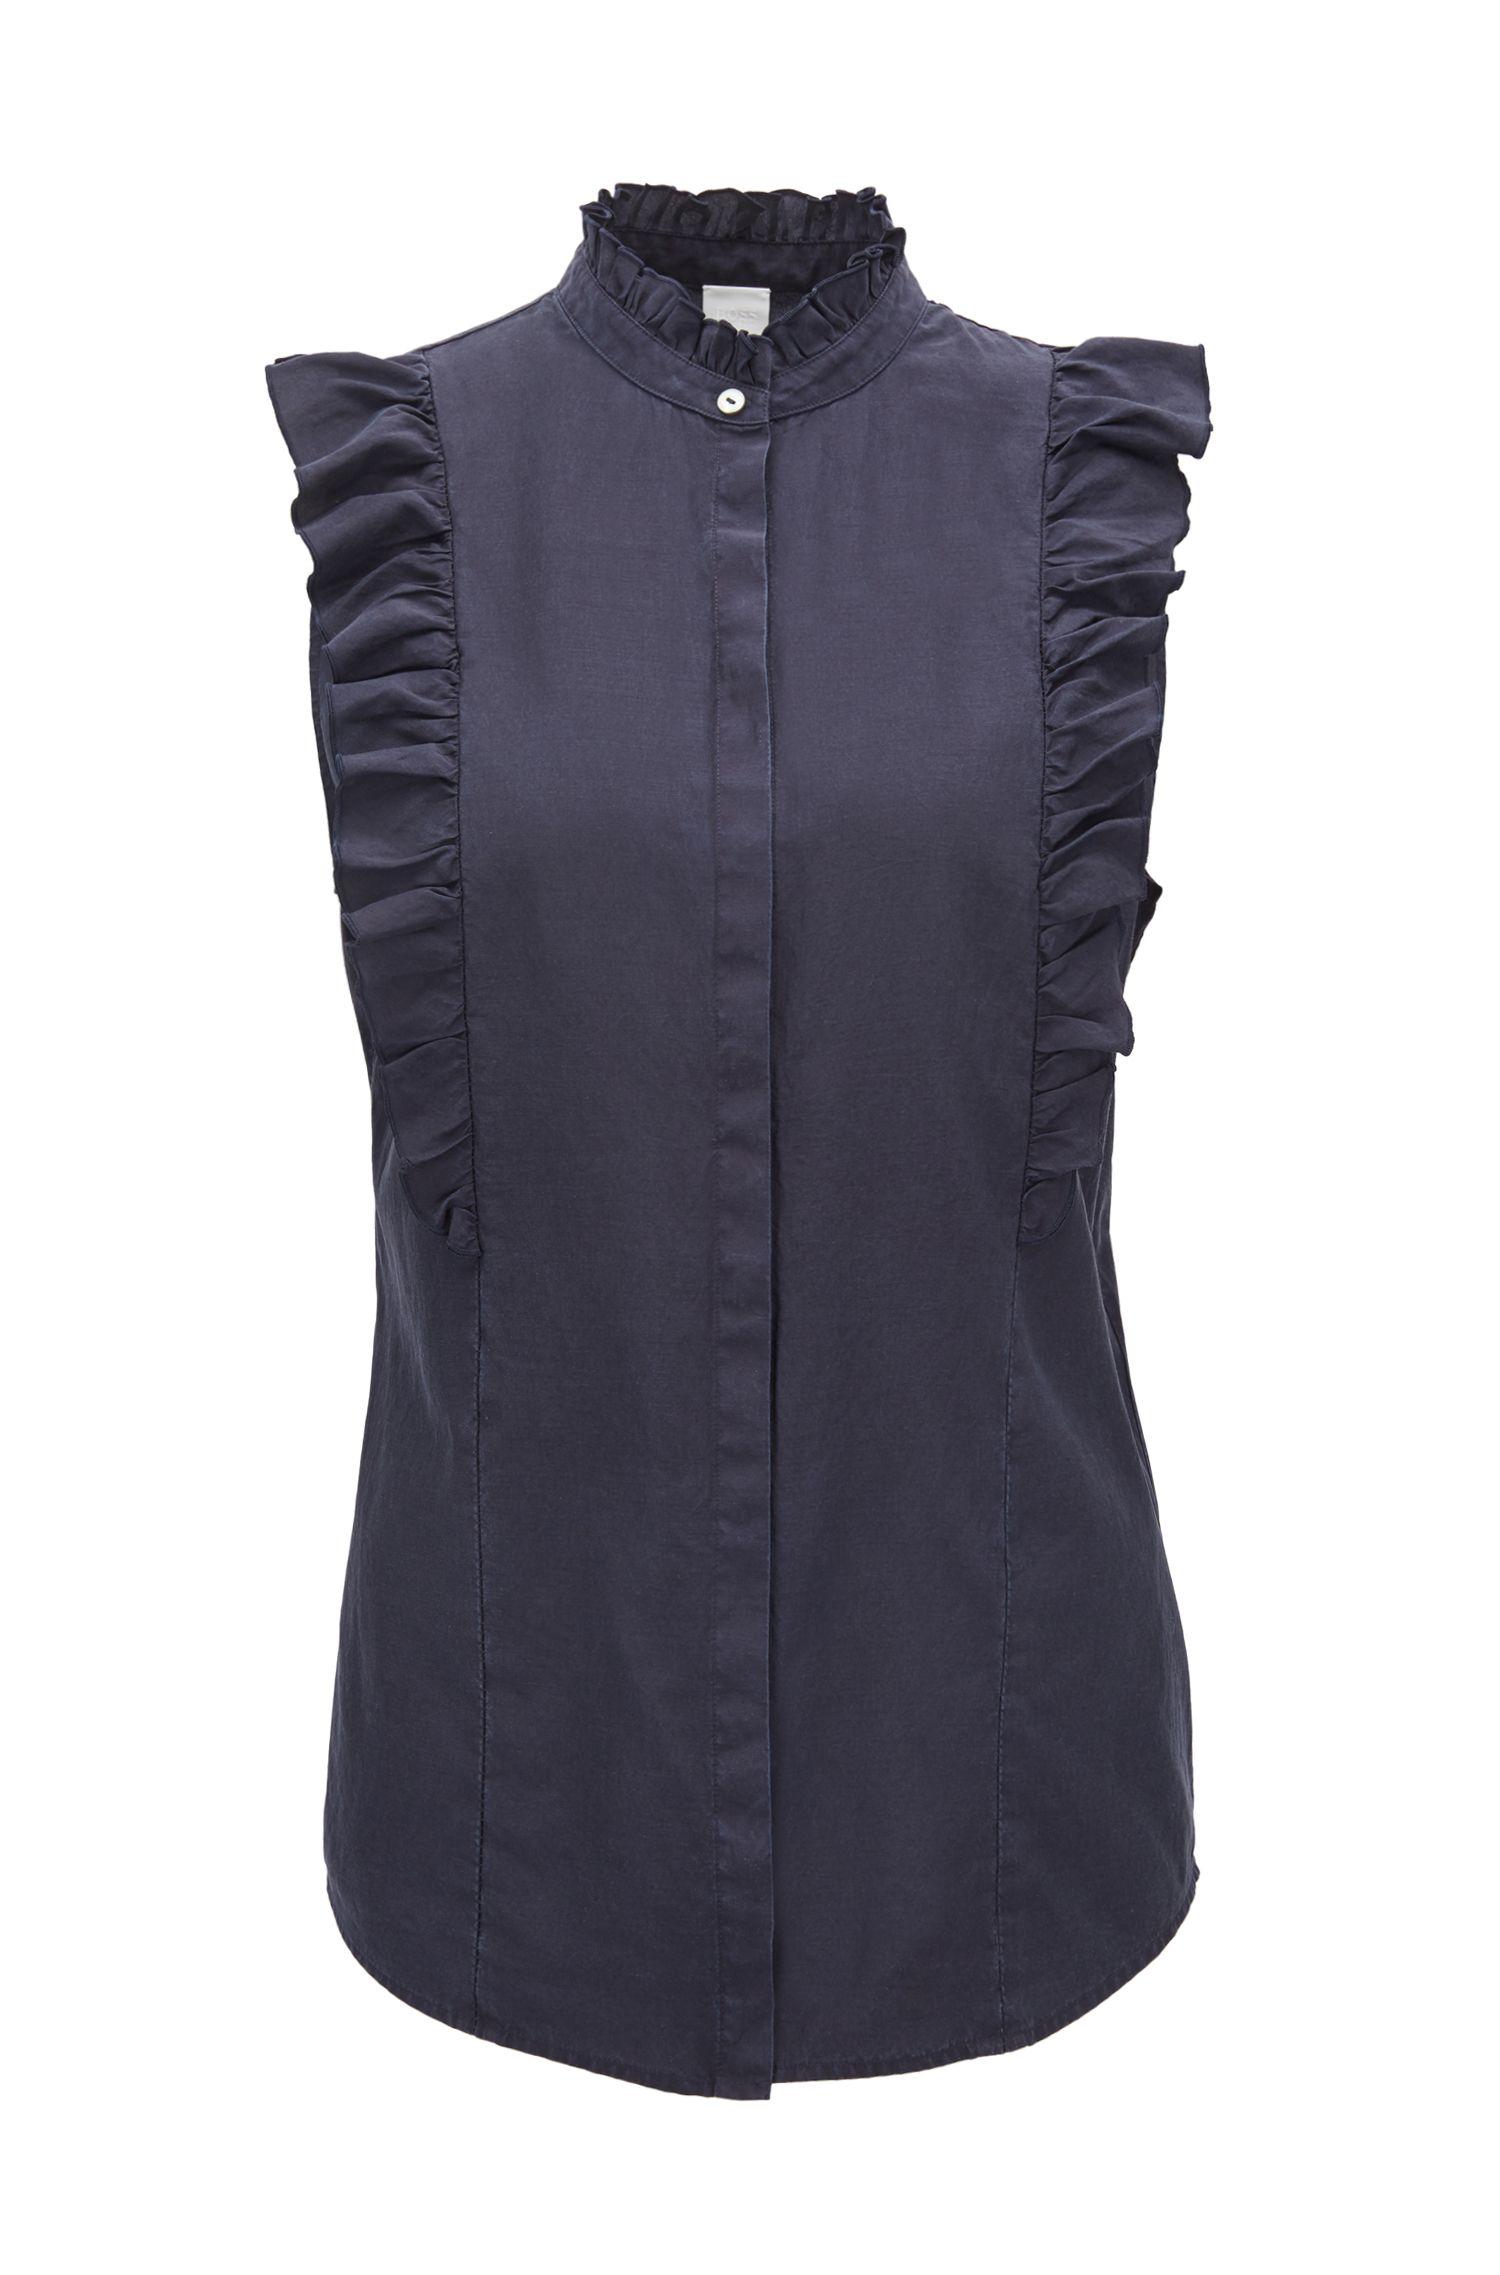 Sleeveless ruffle blouse in a silk-cotton blend